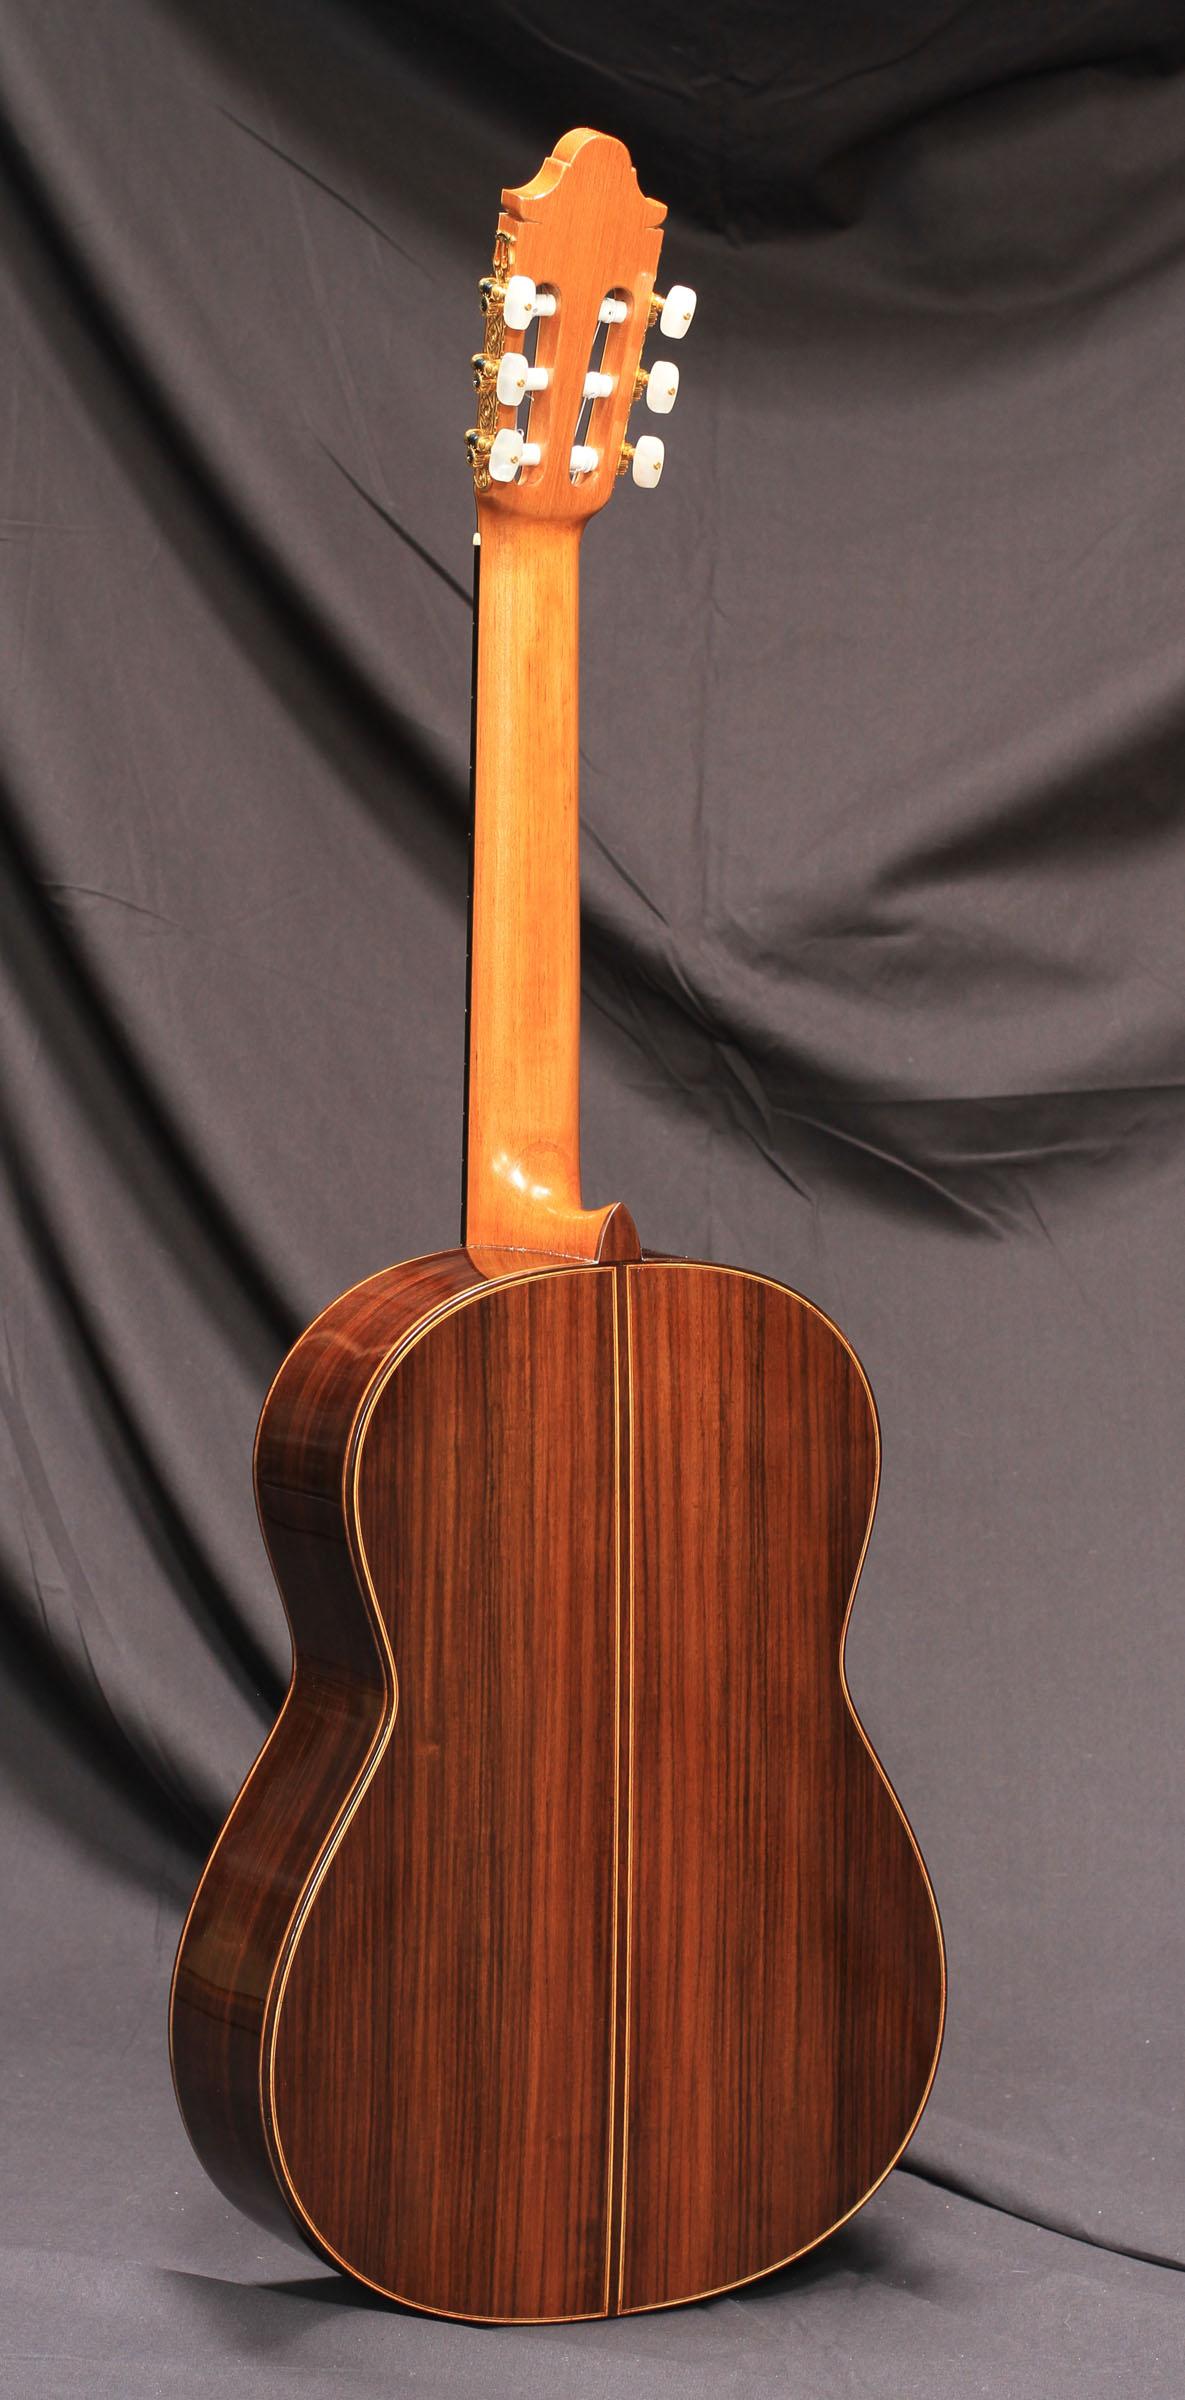 jesus bellido 2011 savage classical guitar. Black Bedroom Furniture Sets. Home Design Ideas